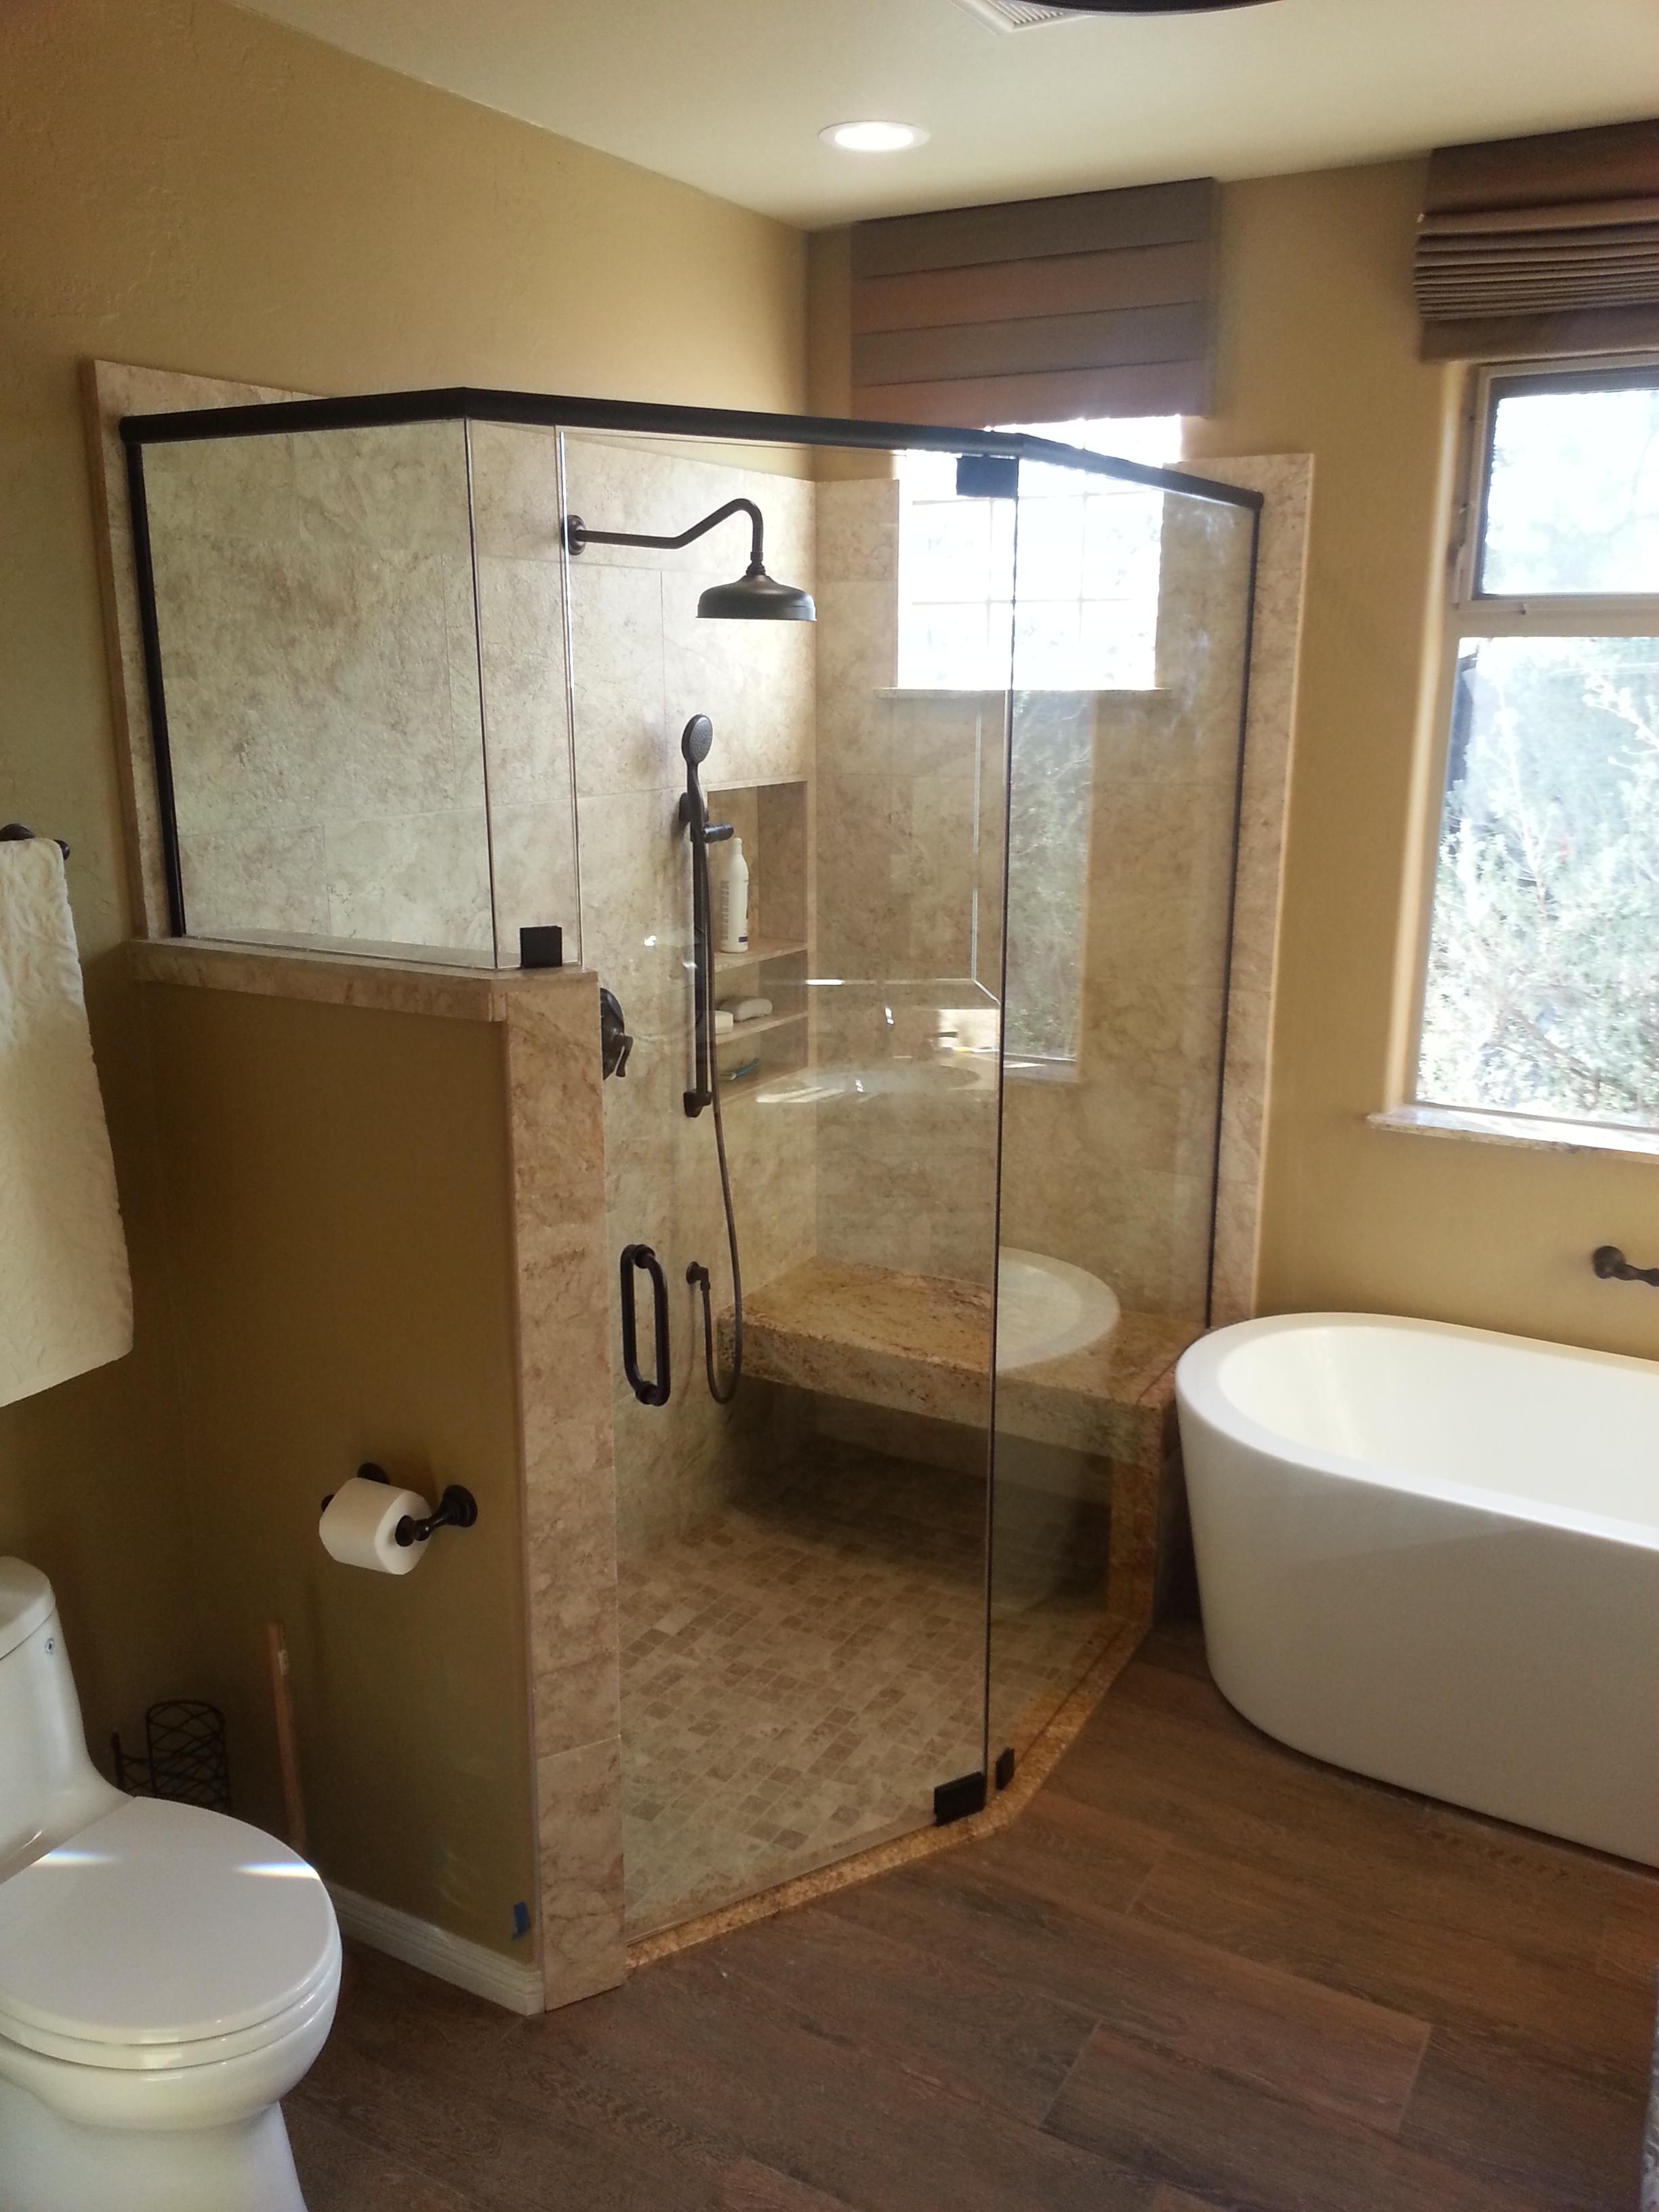 Remodeled bathroom with glass encased shower